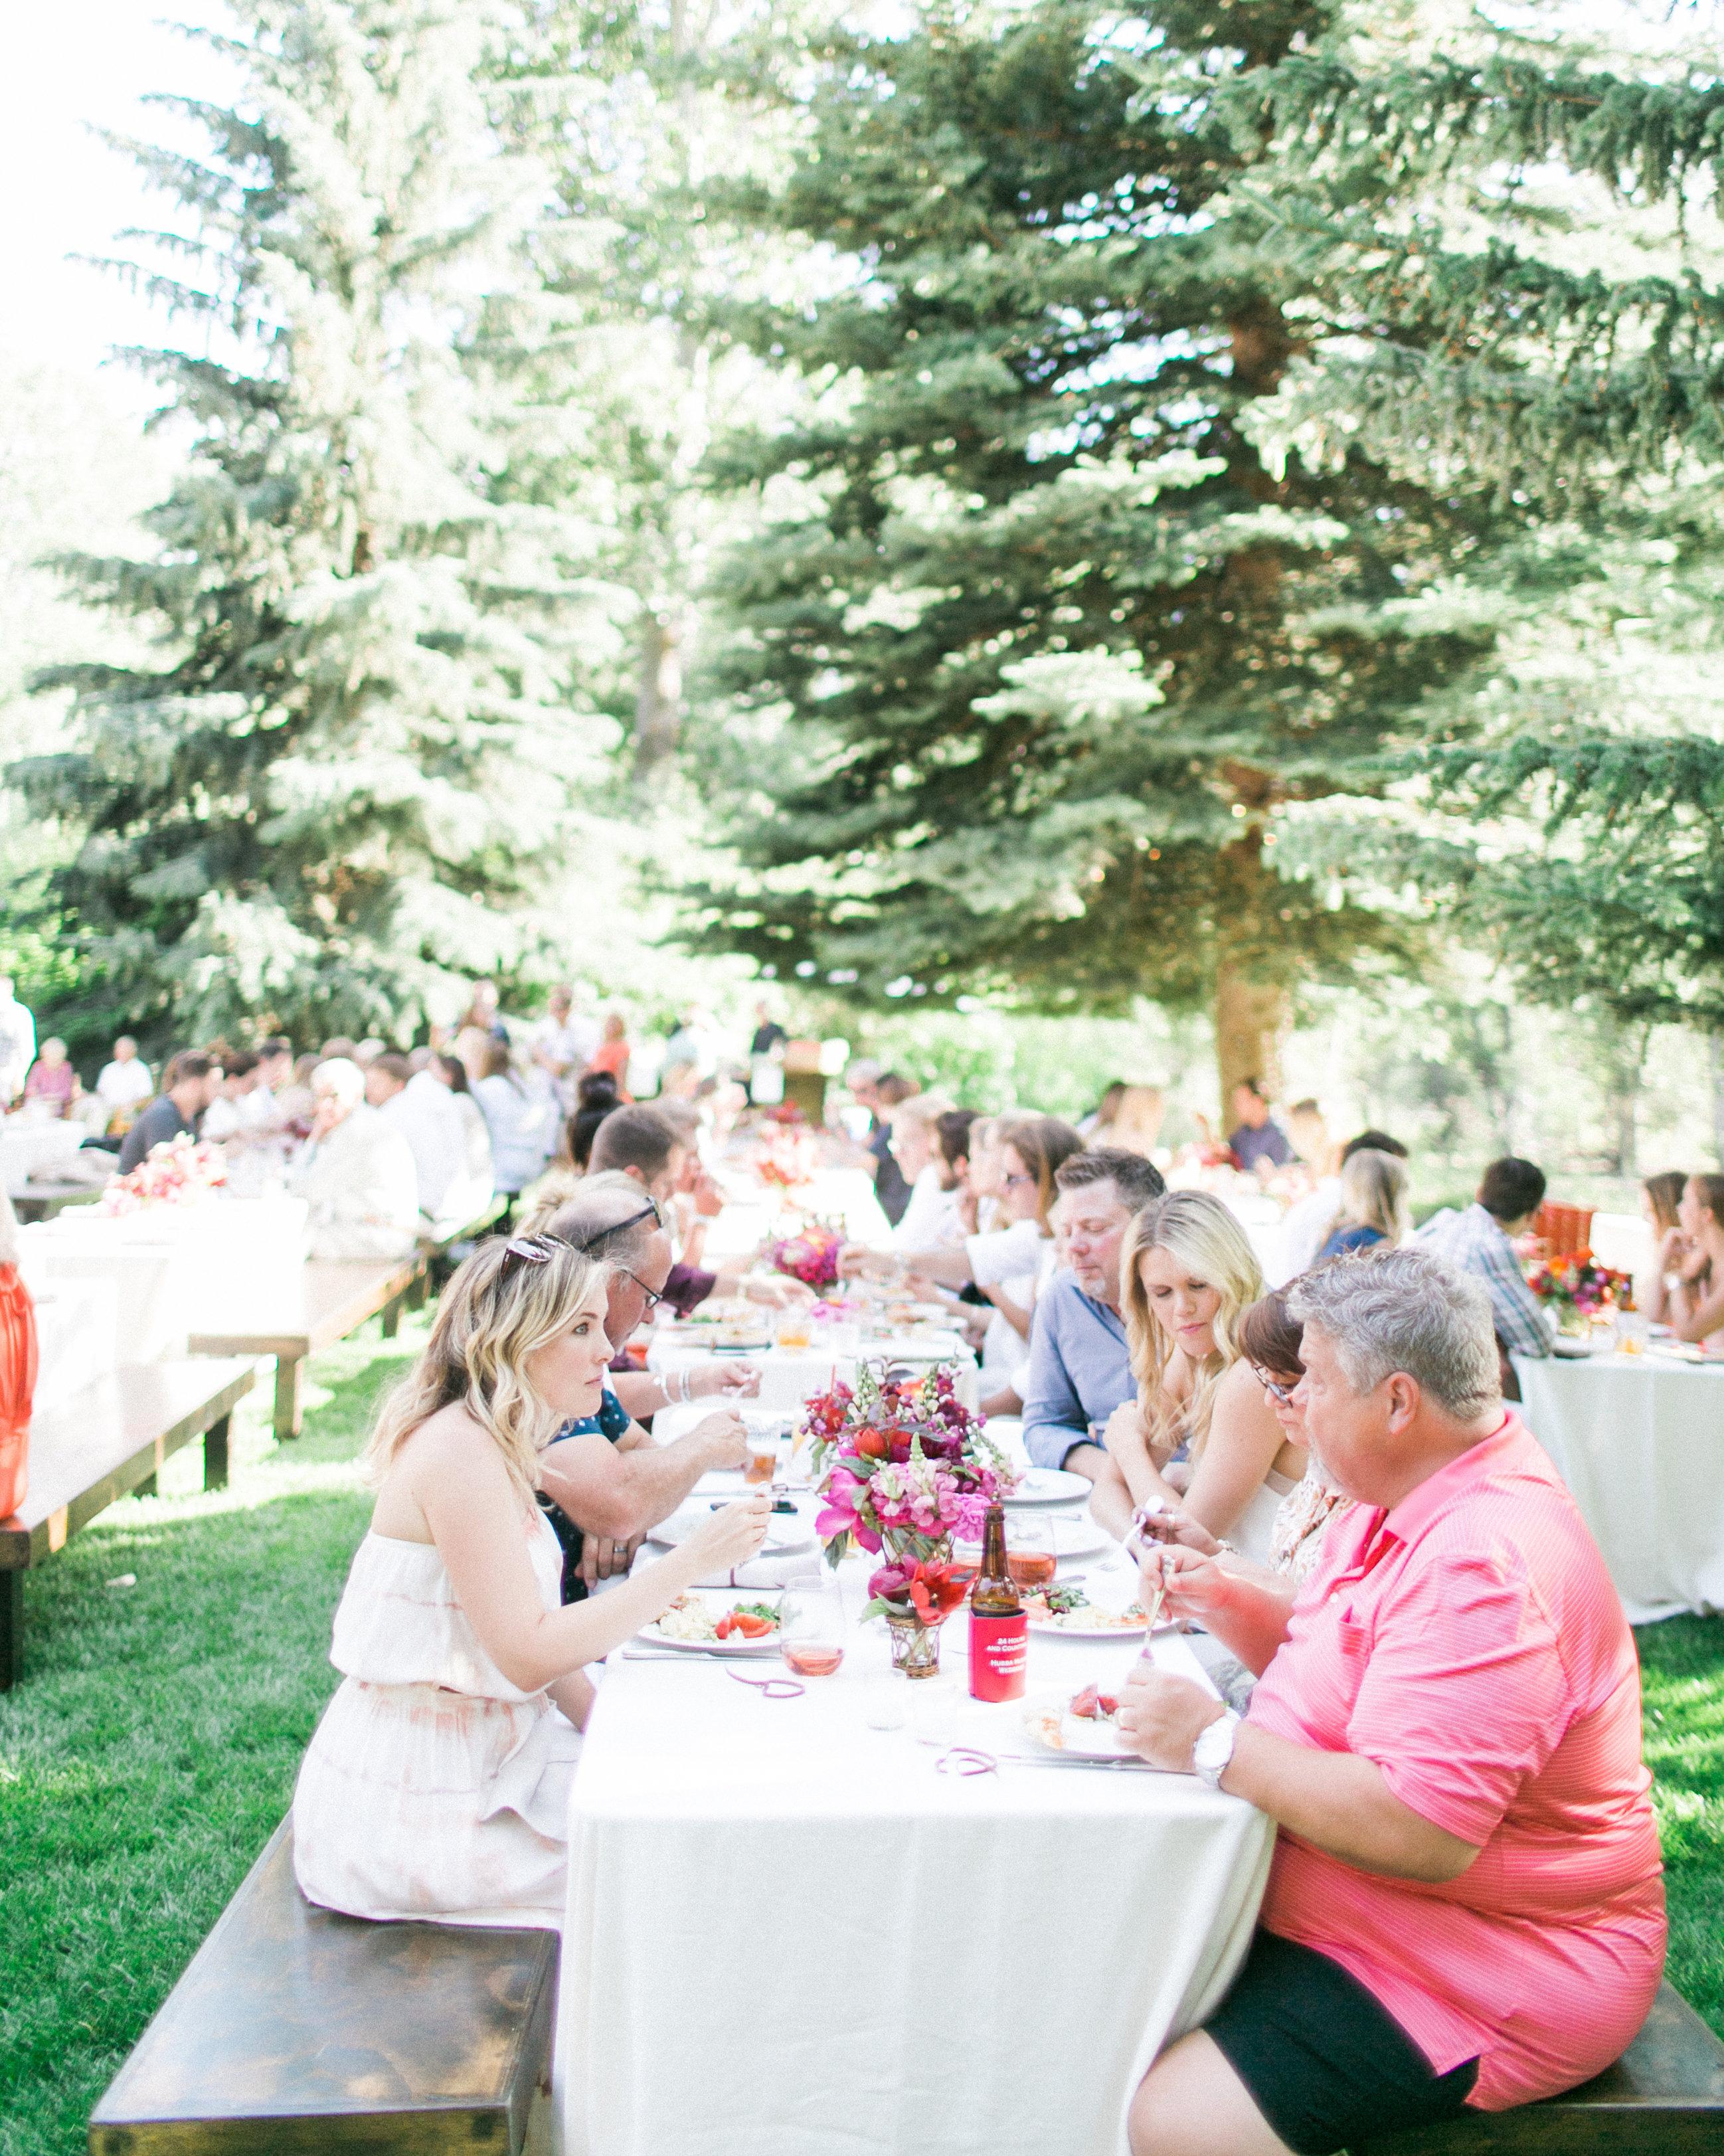 5-backyard-engagement-party-0116.jpg